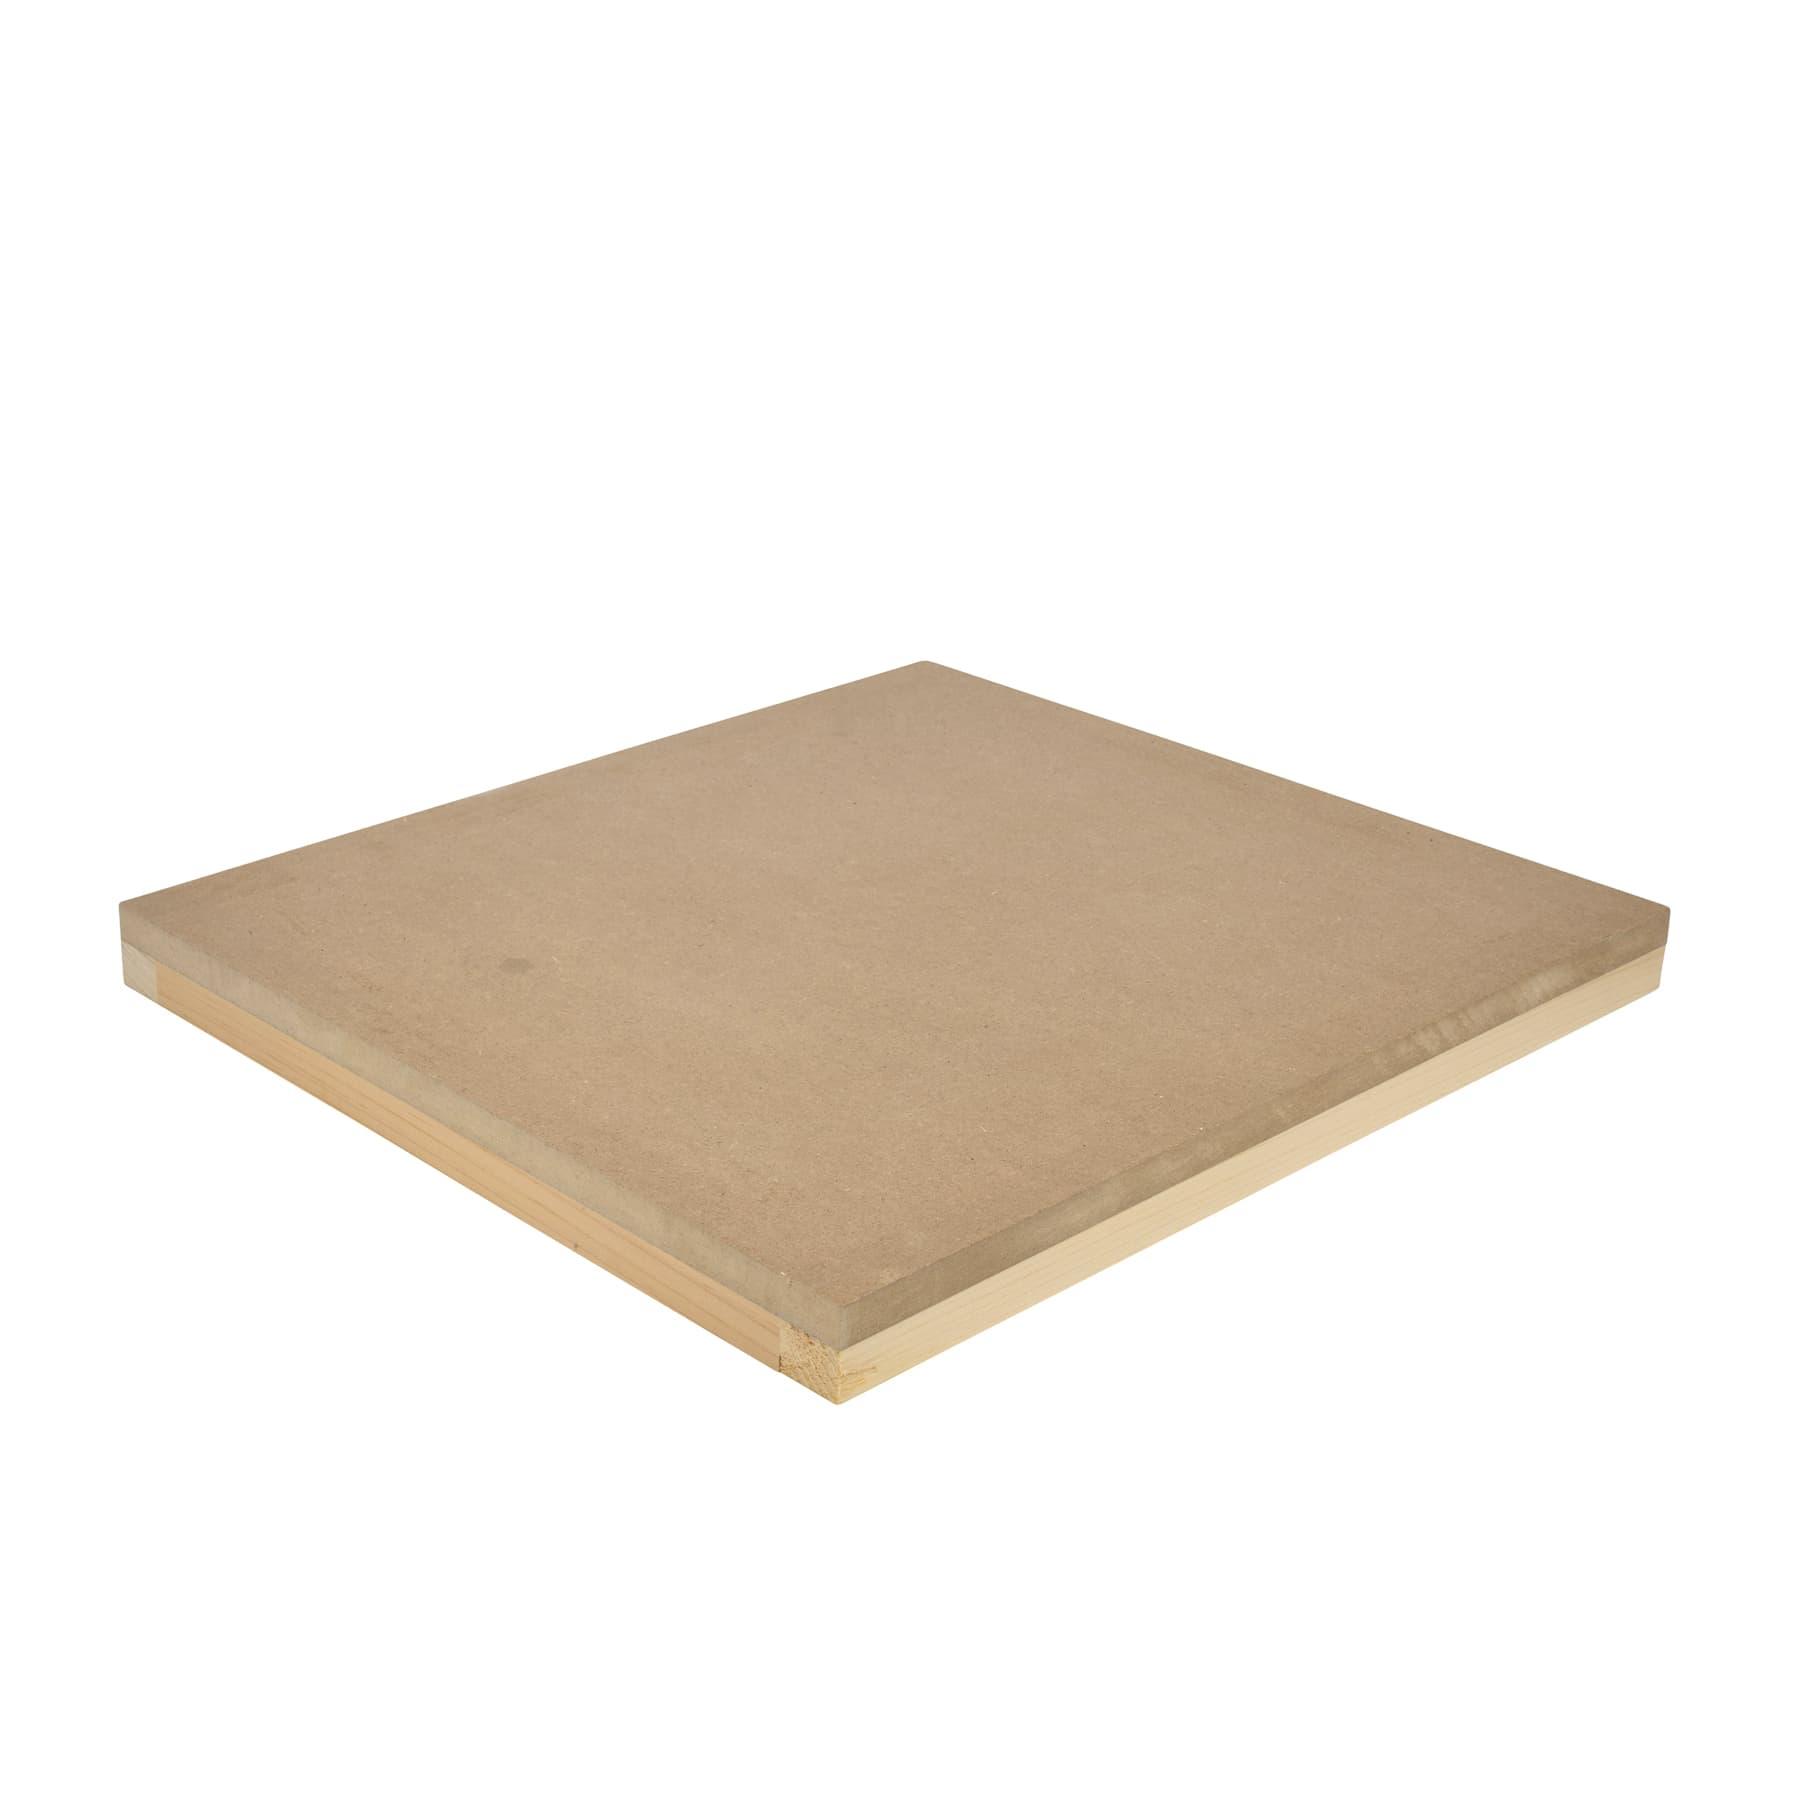 Simplex Holz Deckel